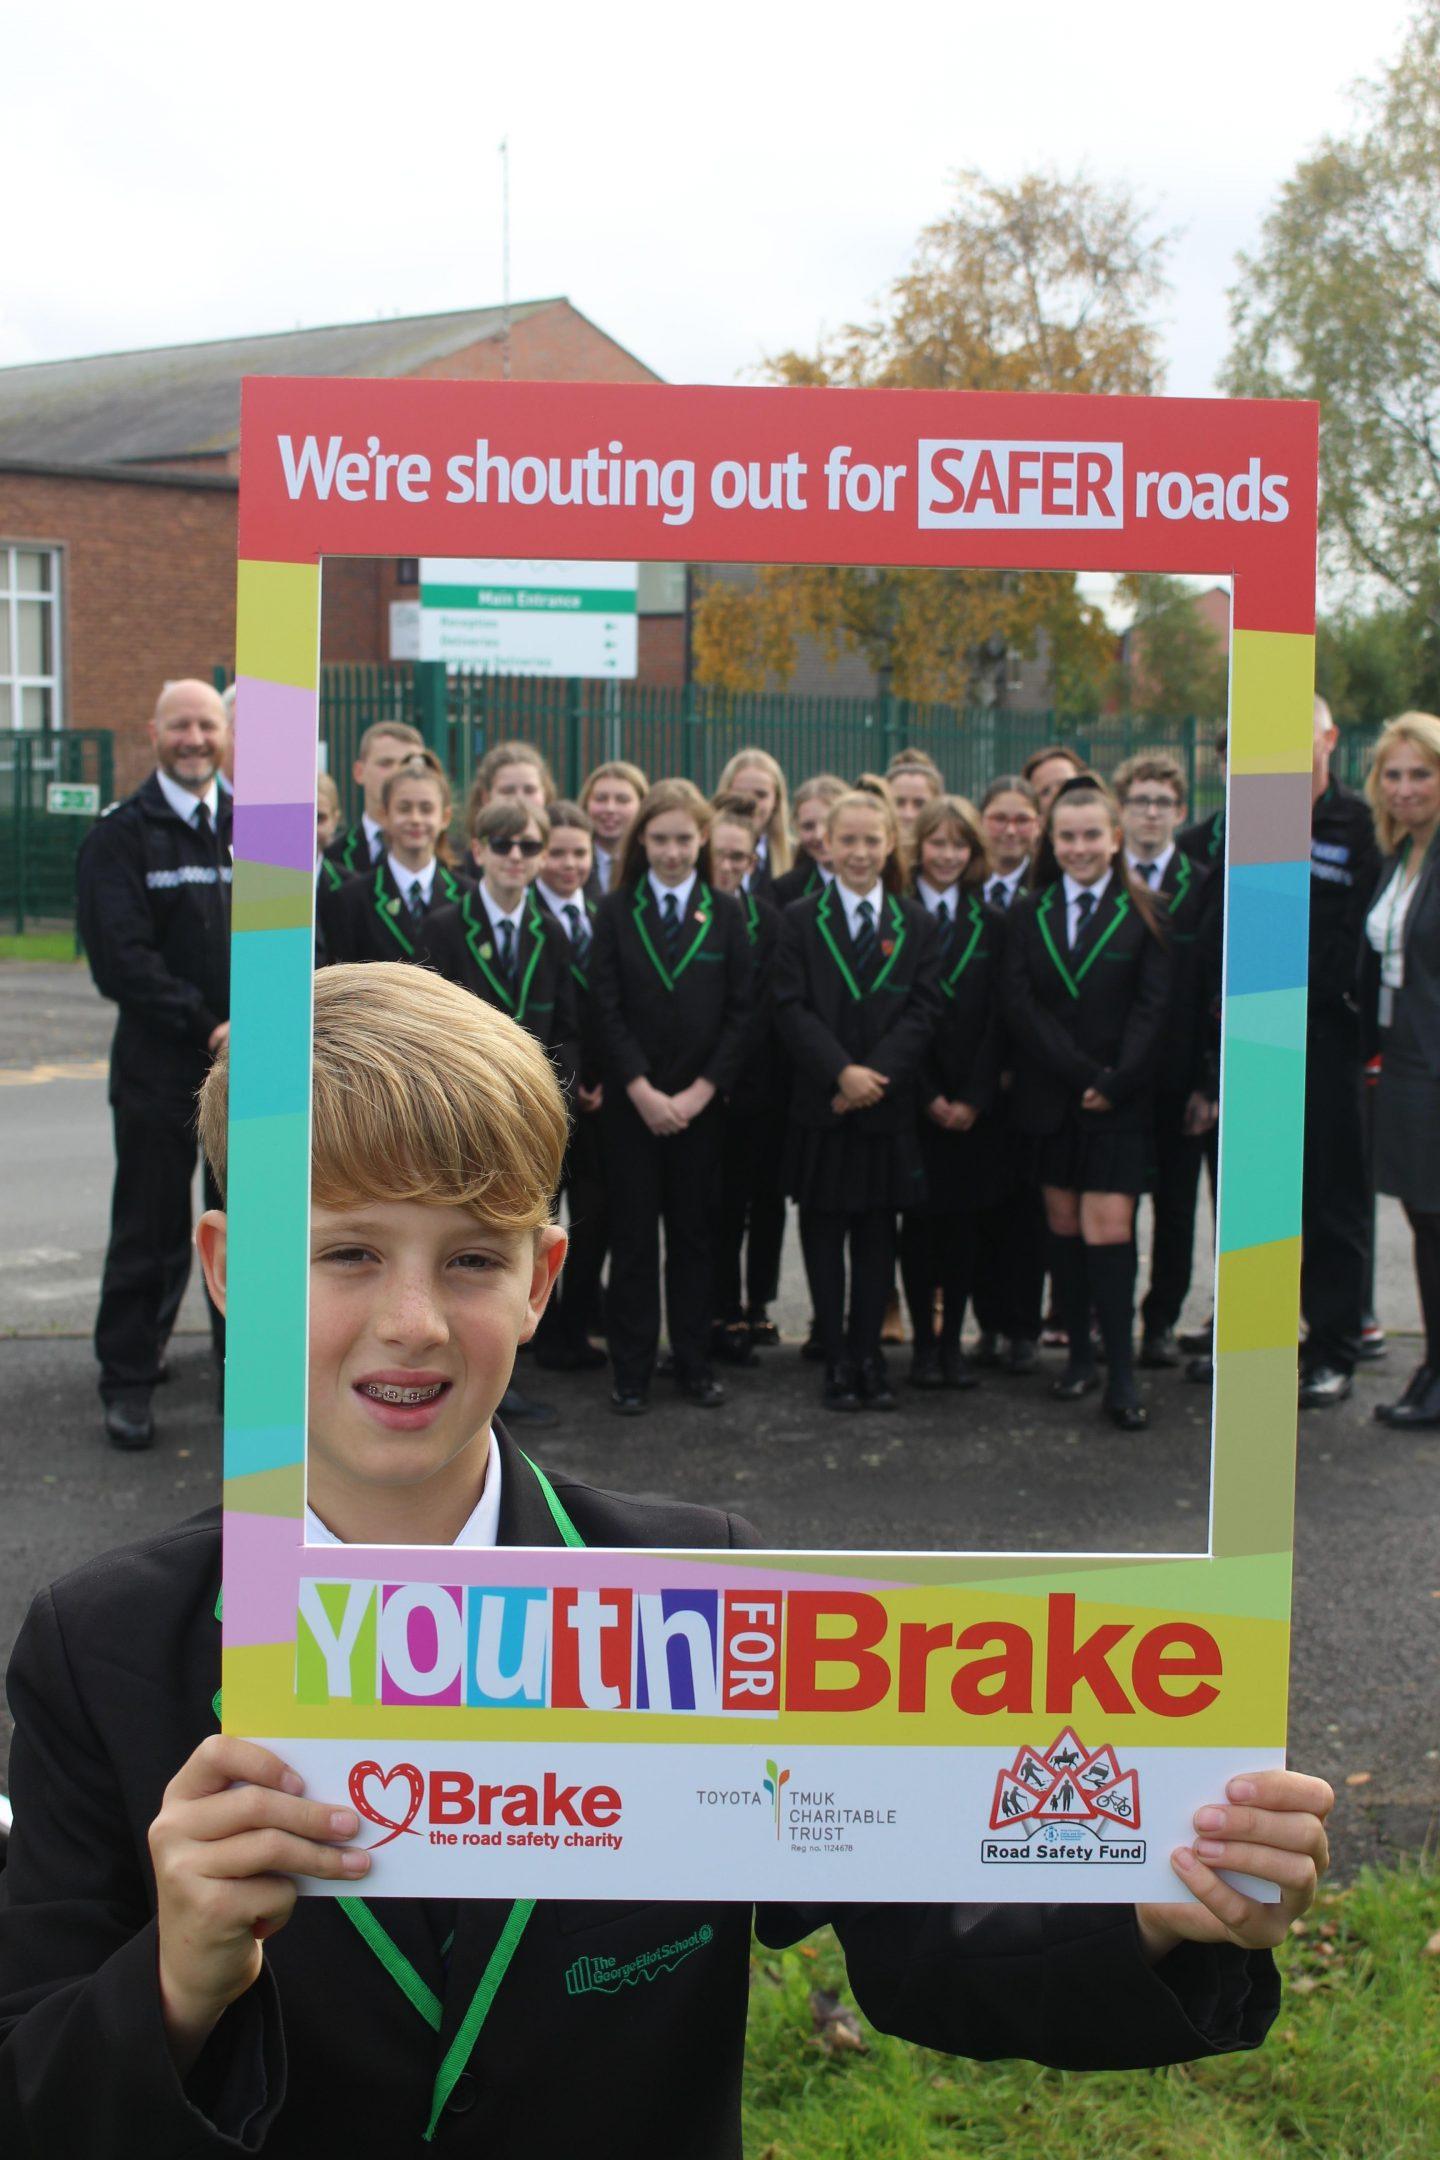 Y4 B Warwickshire George Elliot School Boy in front of group